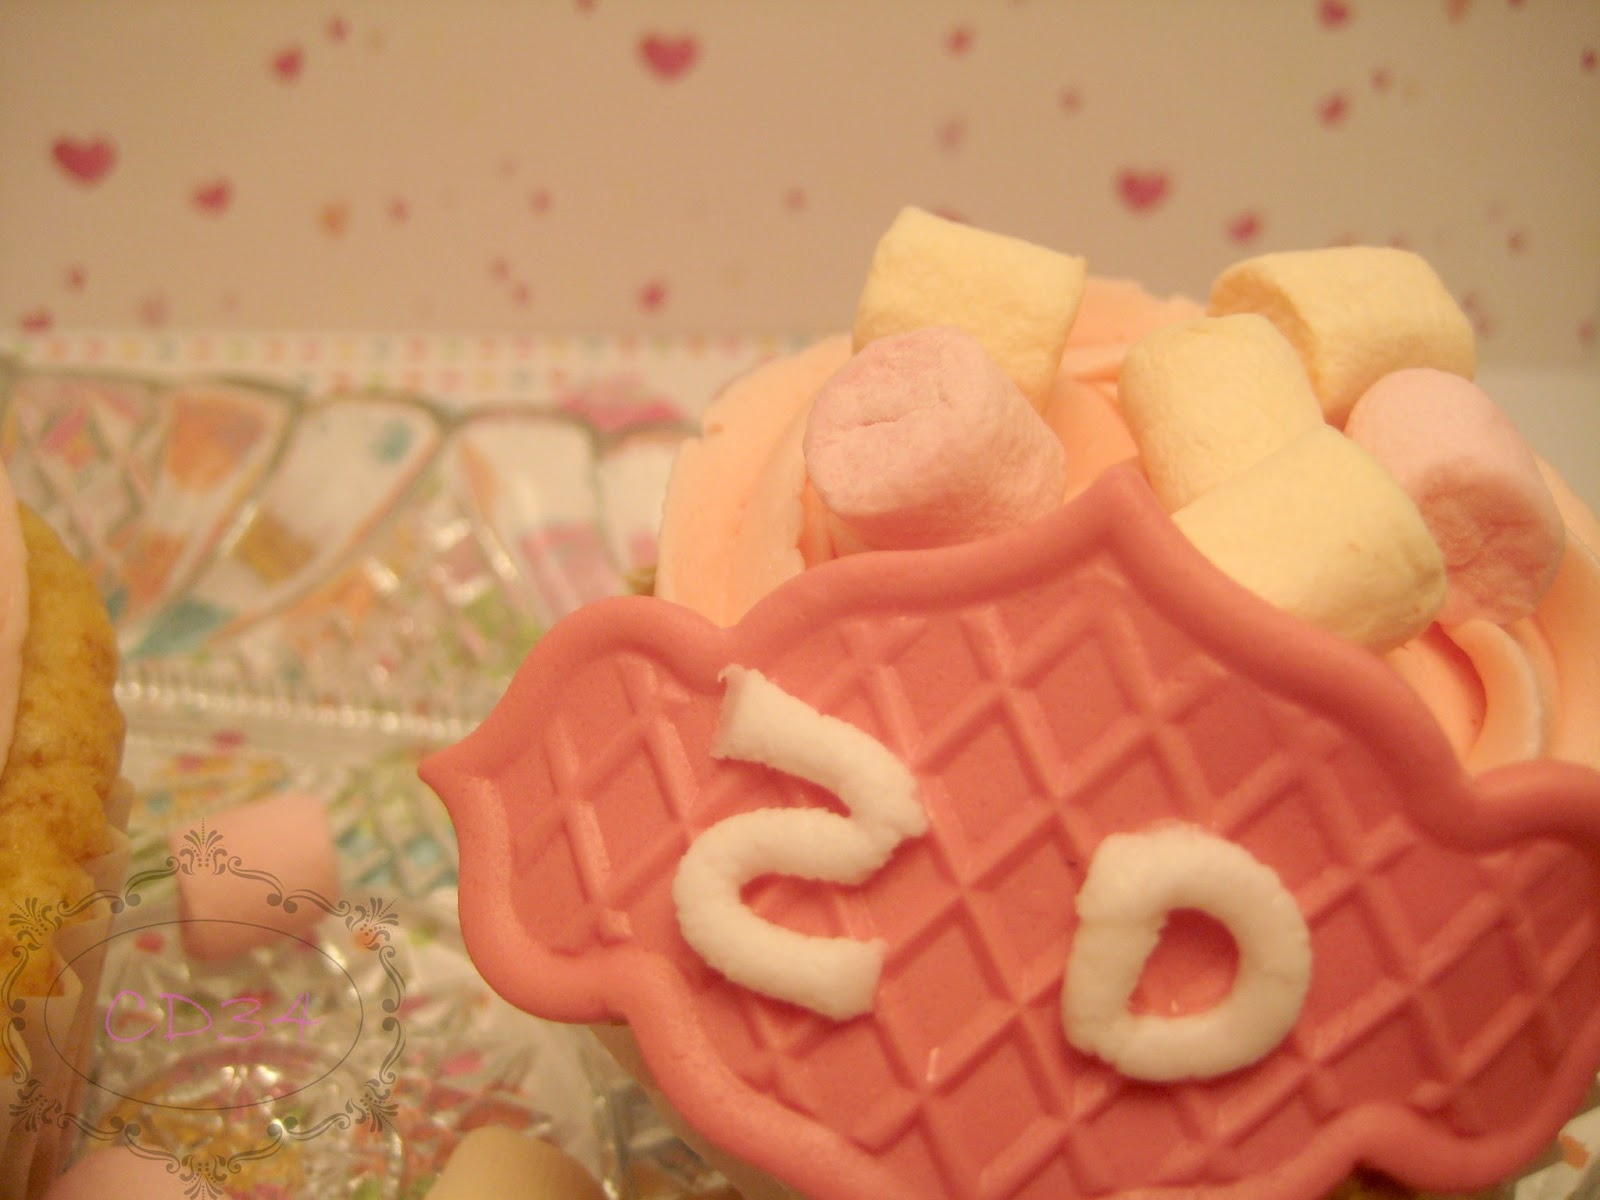 Cosetesdolces34 reto objetivo cupcake perfecto - Objetivo cupcake perfecto blog ...